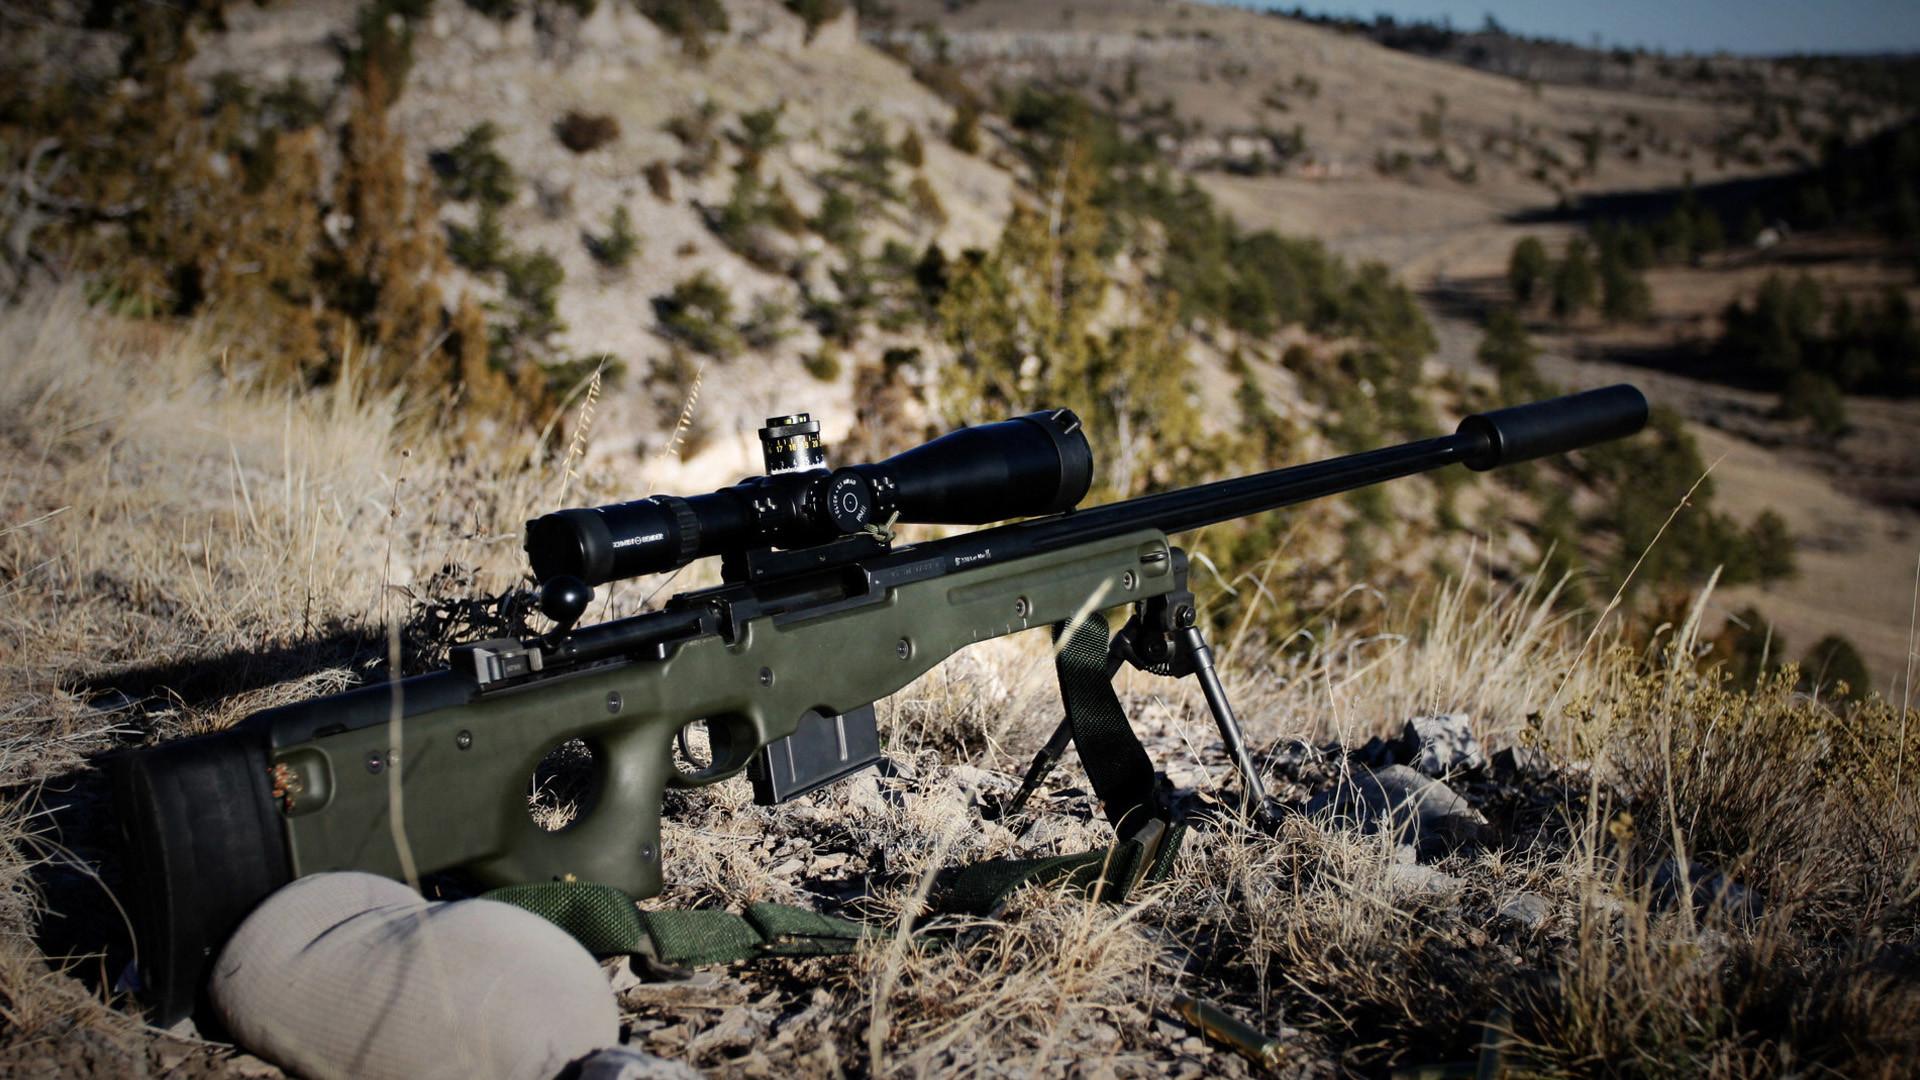 Sniper Rifle Wallpaper 73 images 1920x1080